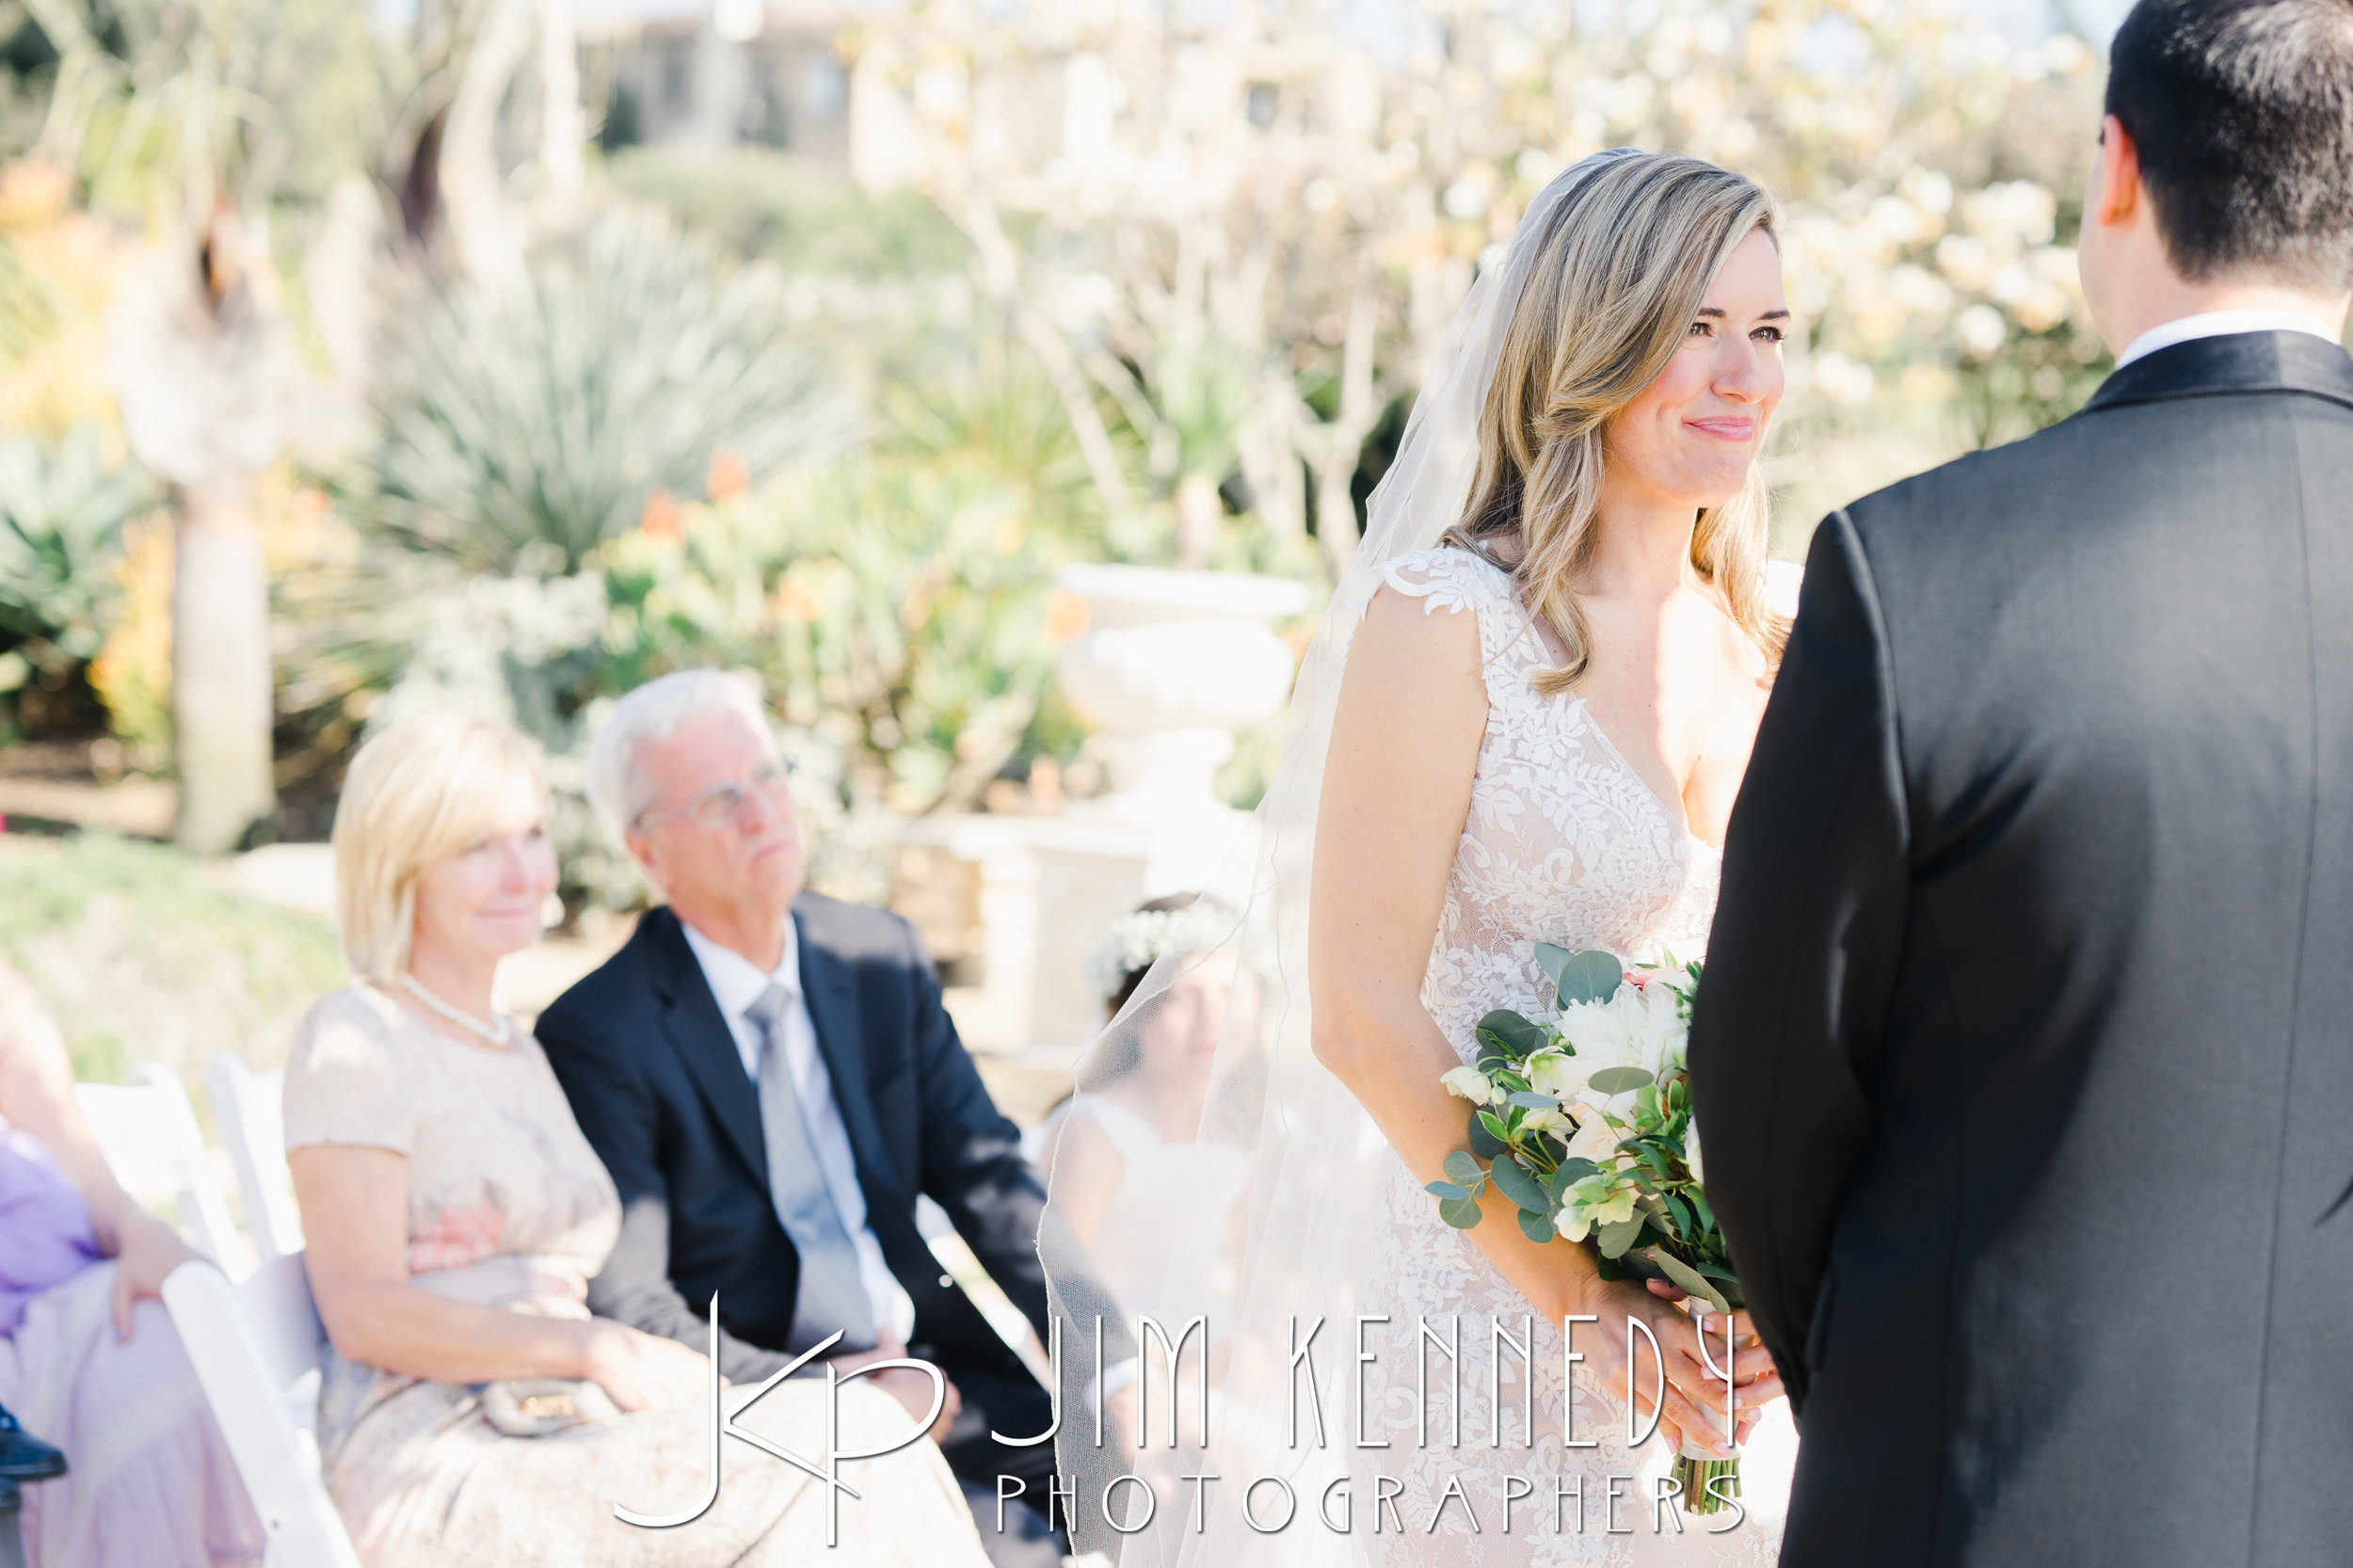 monarch-beach-resort-wedding-JKP_0086.JPG